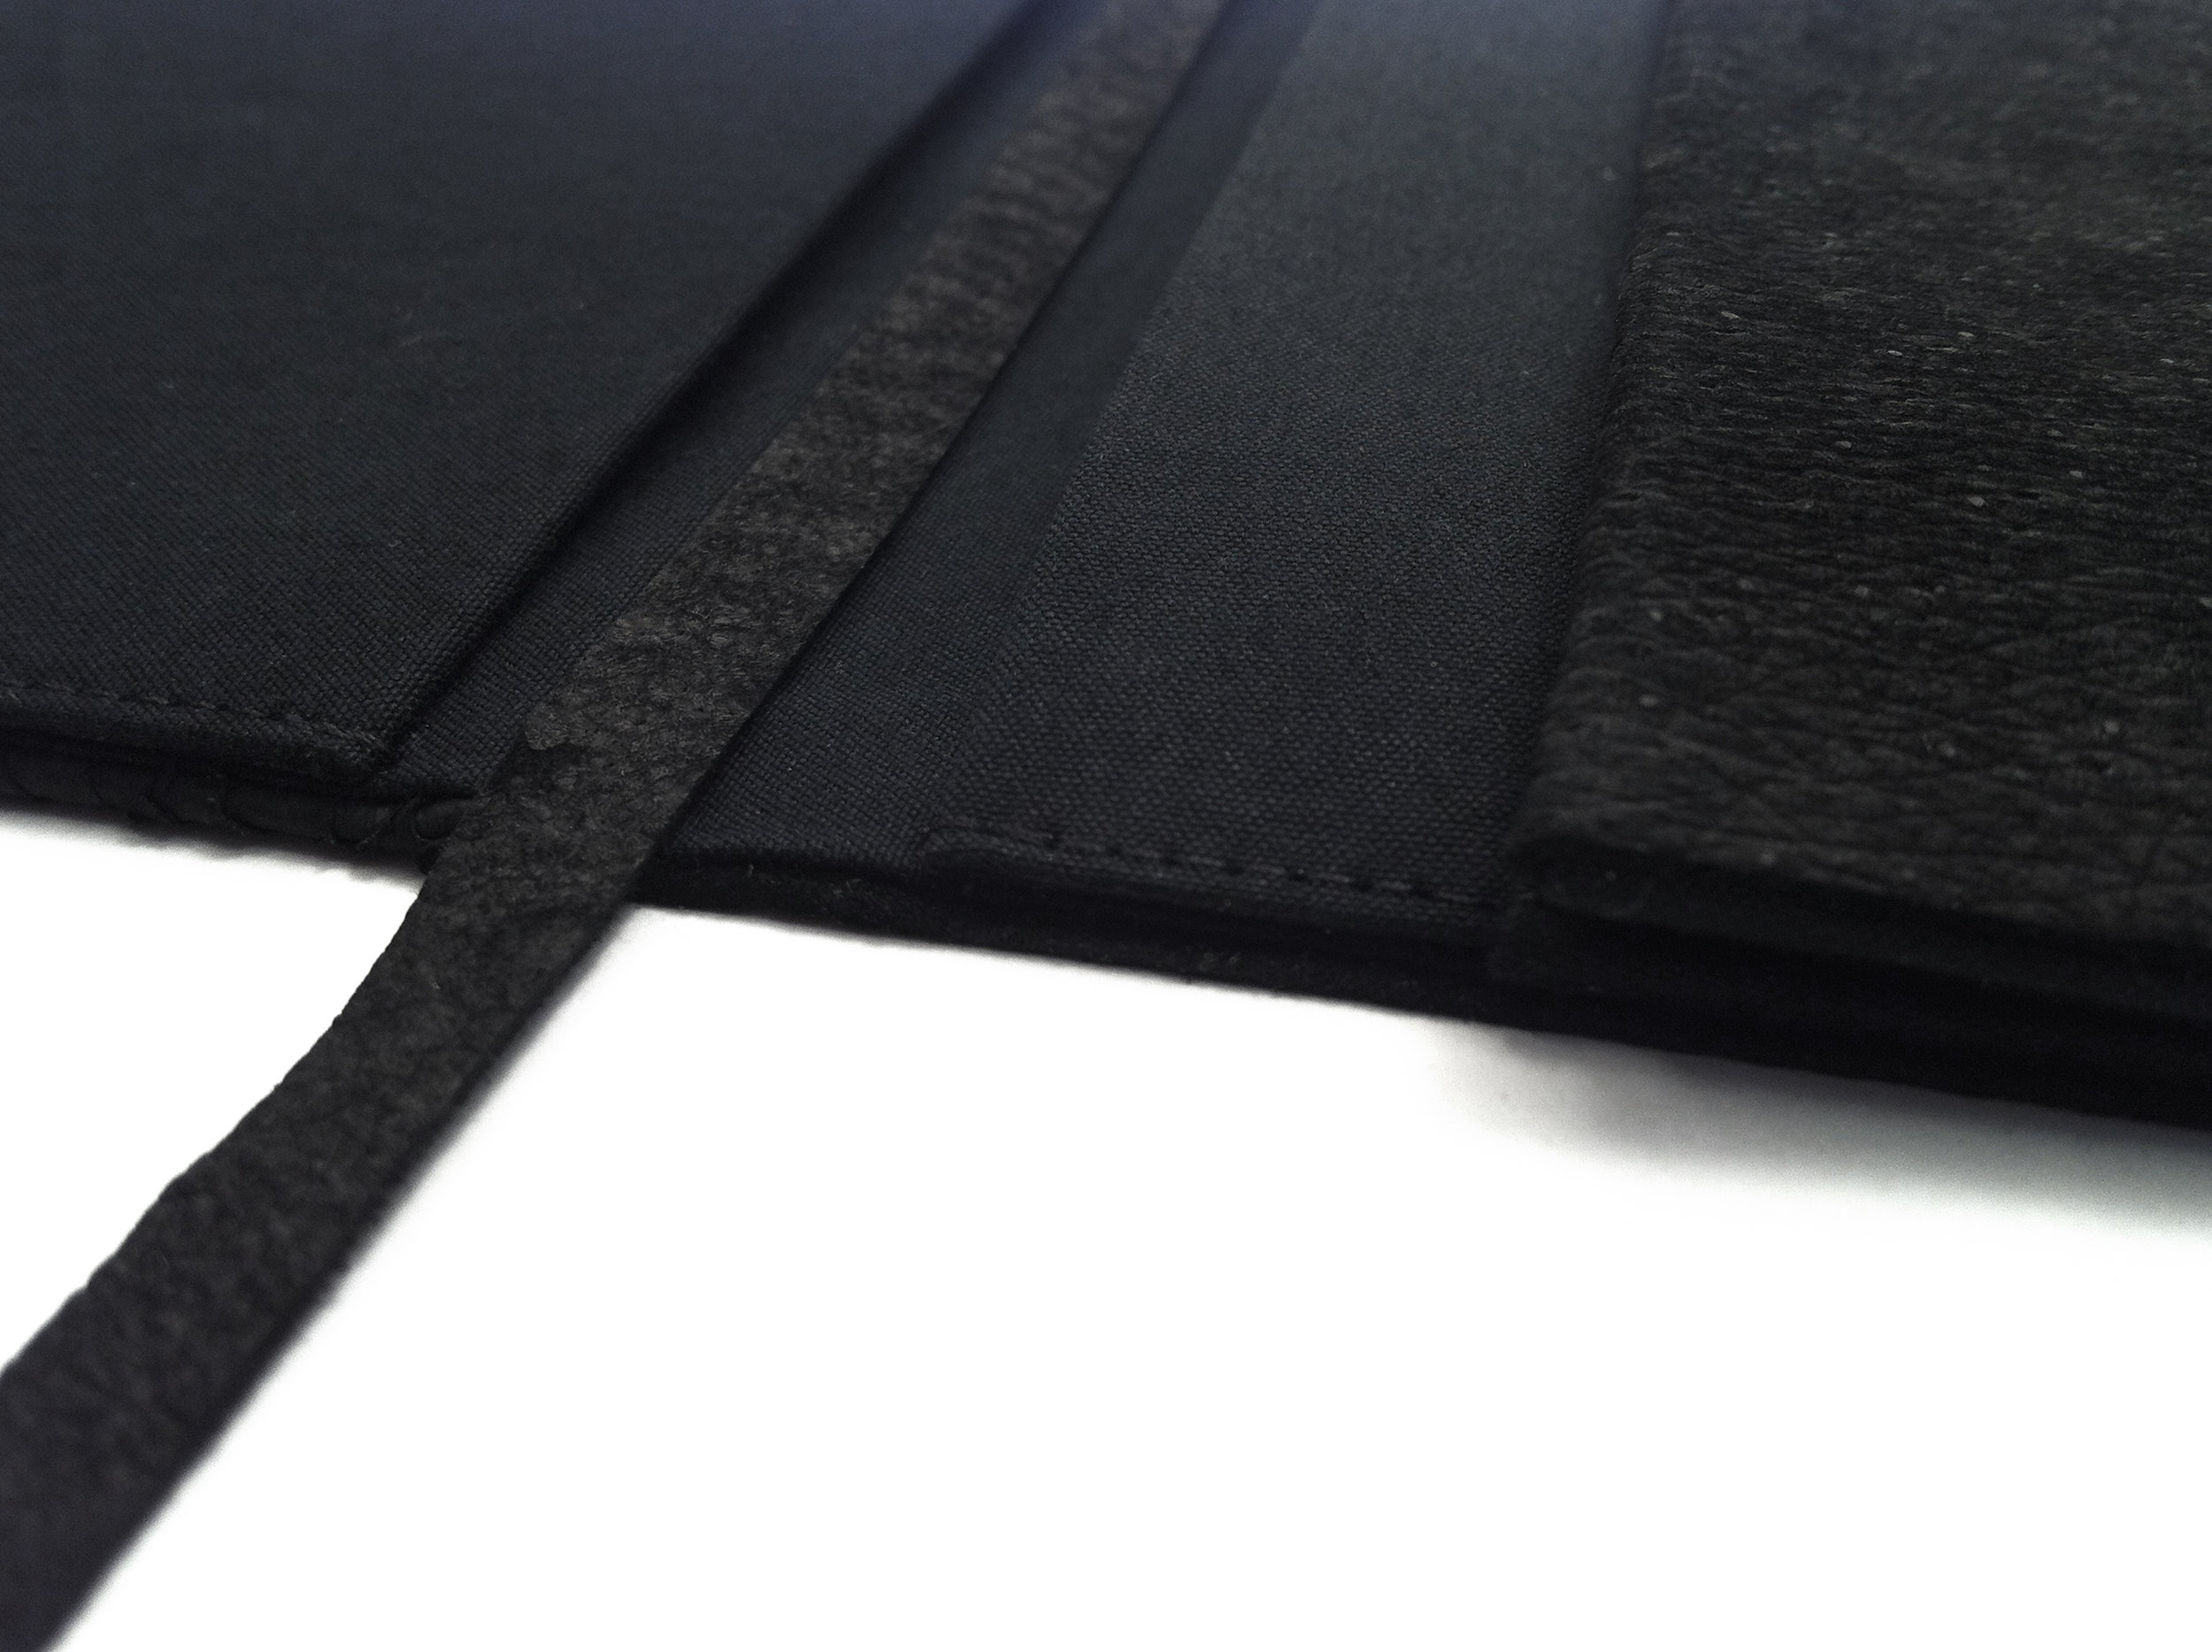 HYD - Notebook Detail